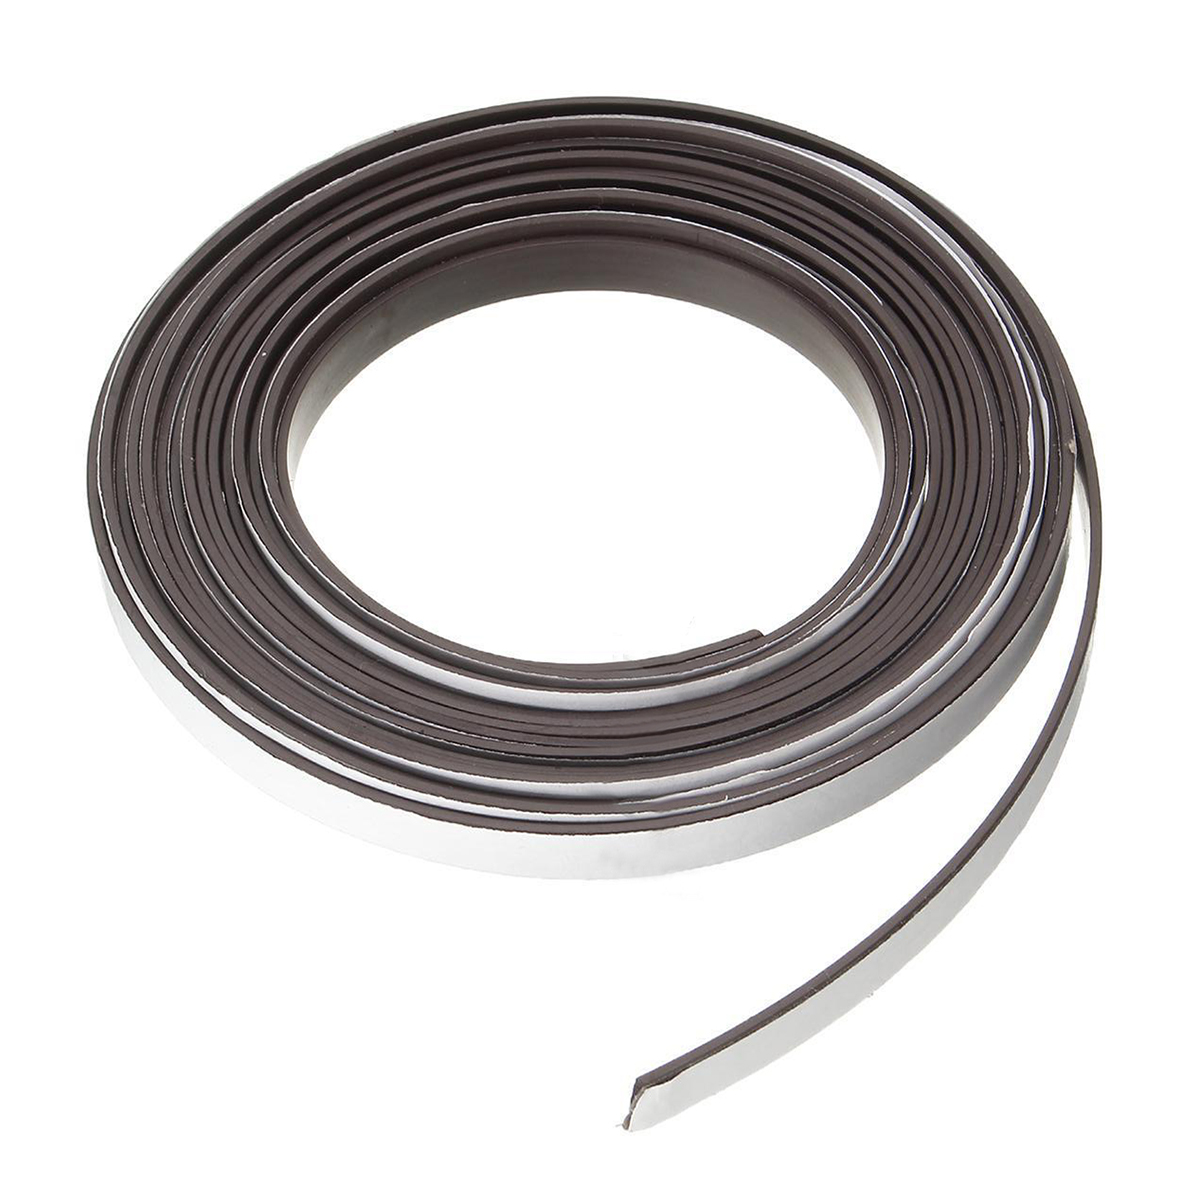 New 5M Rubber Magnetic Stripe Self Adhesive Flexible Magnet DIY ...